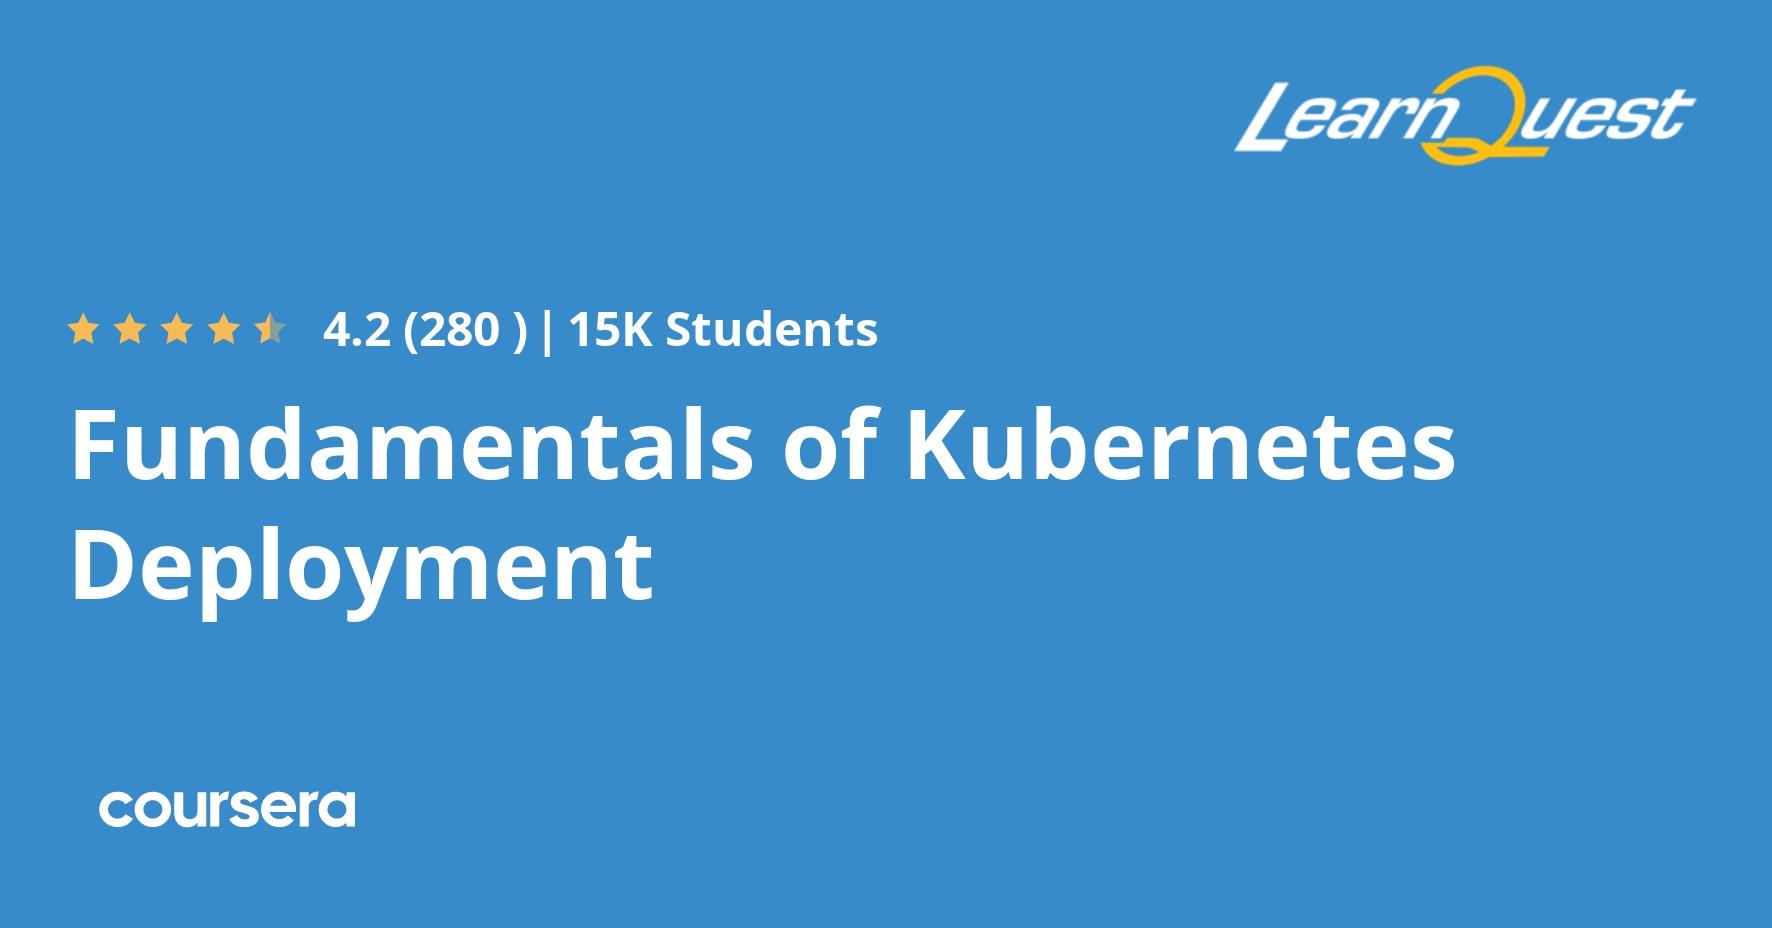 Fundamentals of Kubernetes Deployment (Coursera)